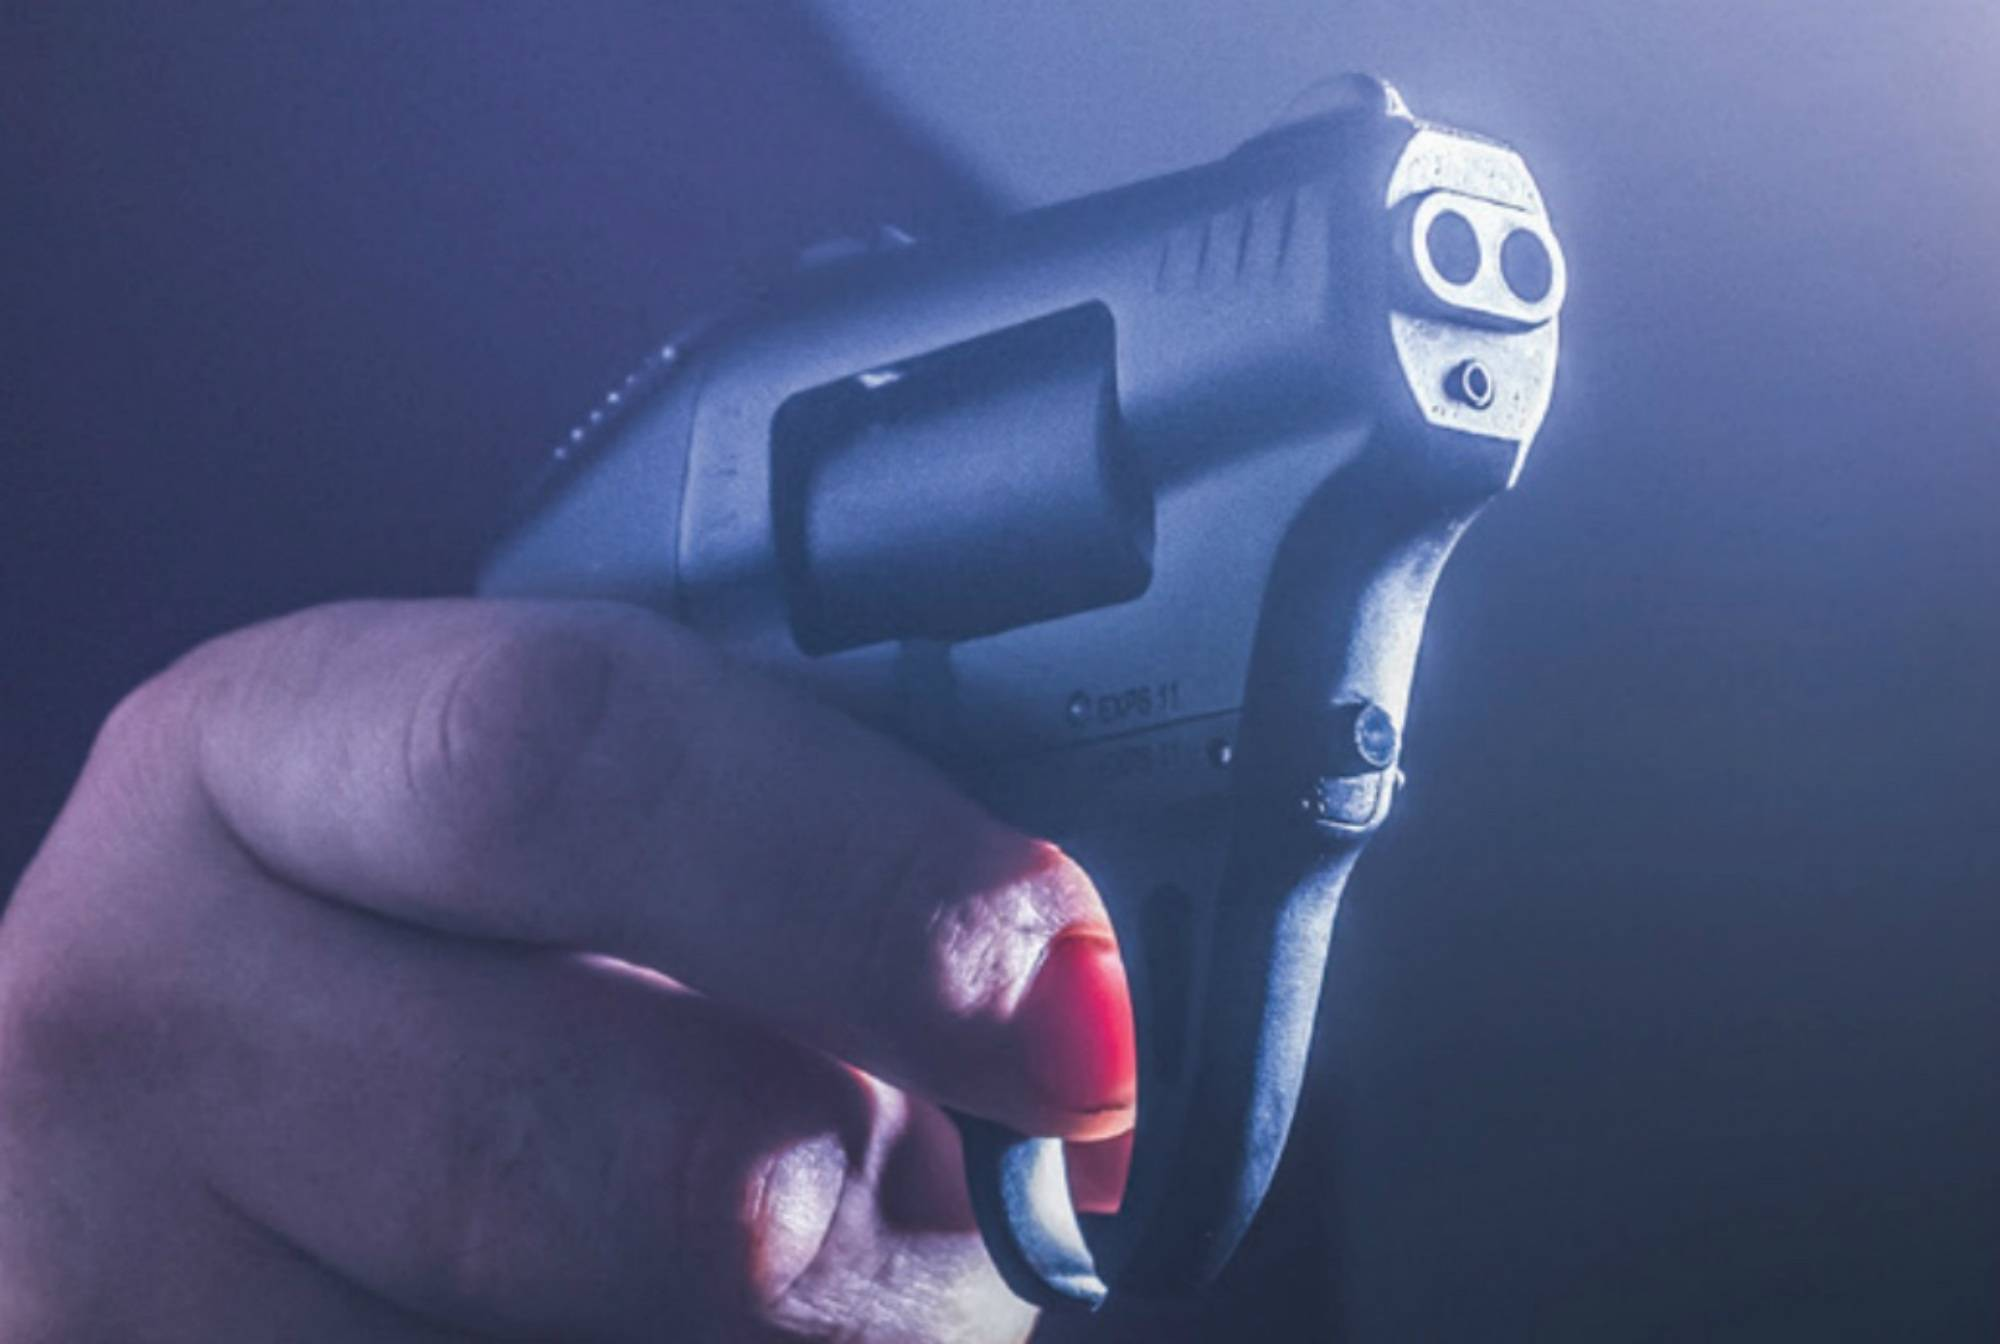 Gun review: standard manufacturing s333 thunderstruck double barrel revolver - the truth about guns